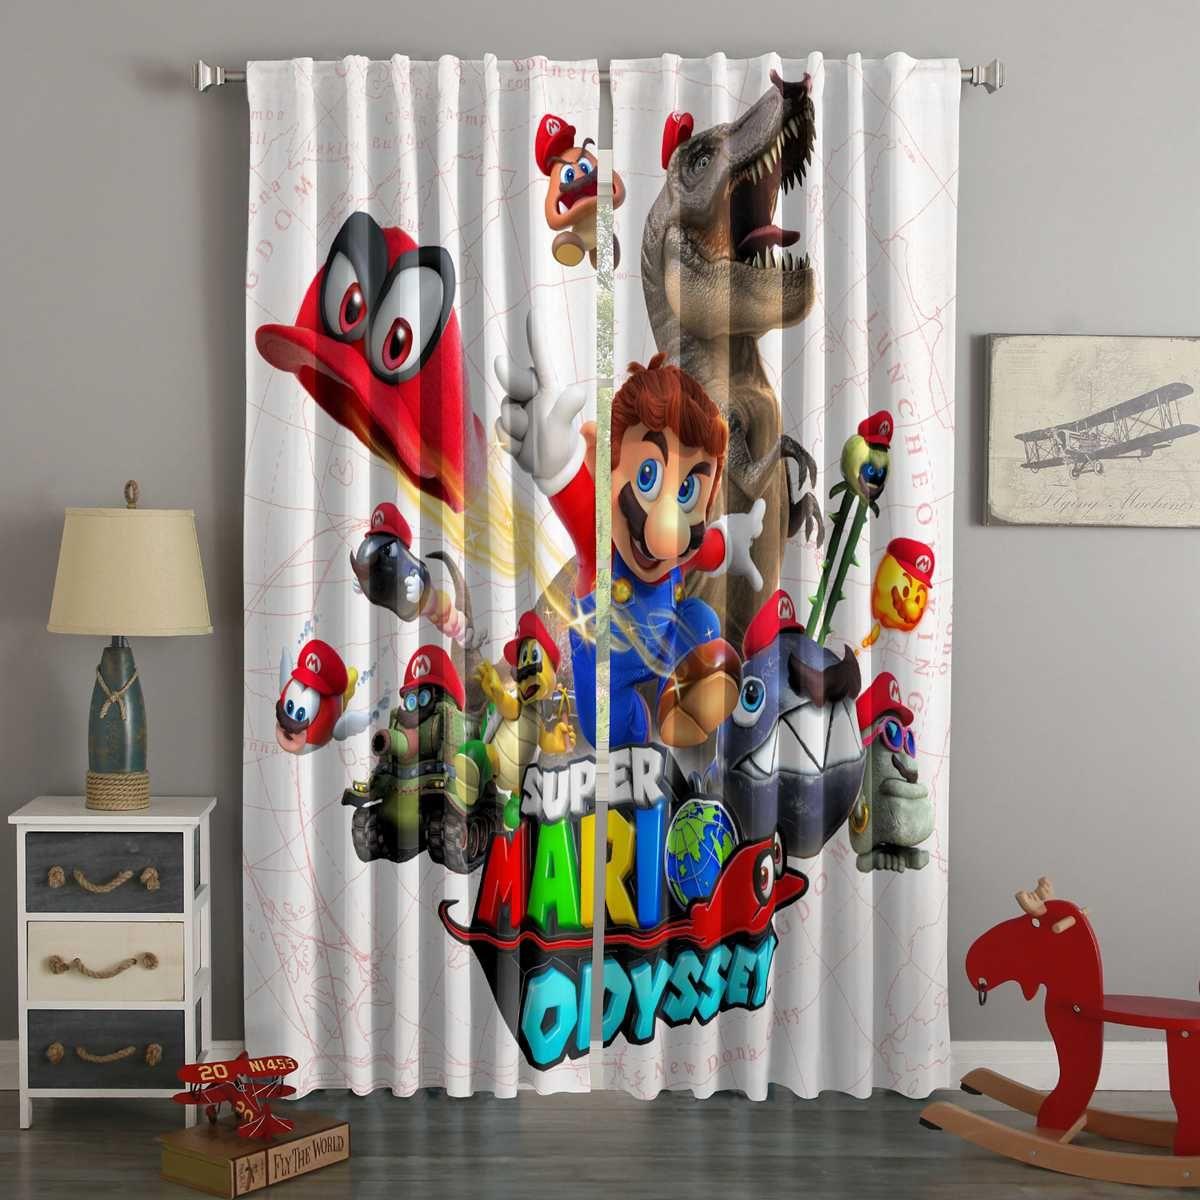 3d Printed Super Mario Odyssey Style Custom Living Room Curtains Curtains Living Room Curtains Super Mario Room